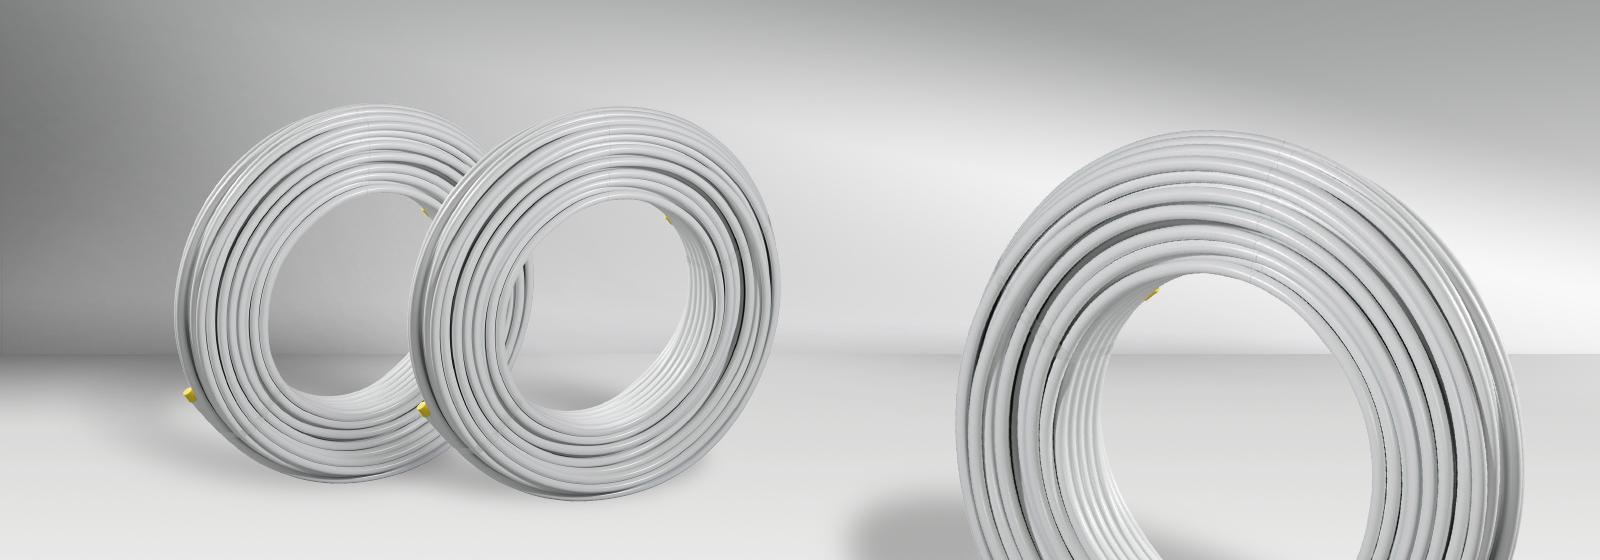 Riscaldamento A Pavimento Tubi tubo per impianti radianti a pavimento   riscaldamento